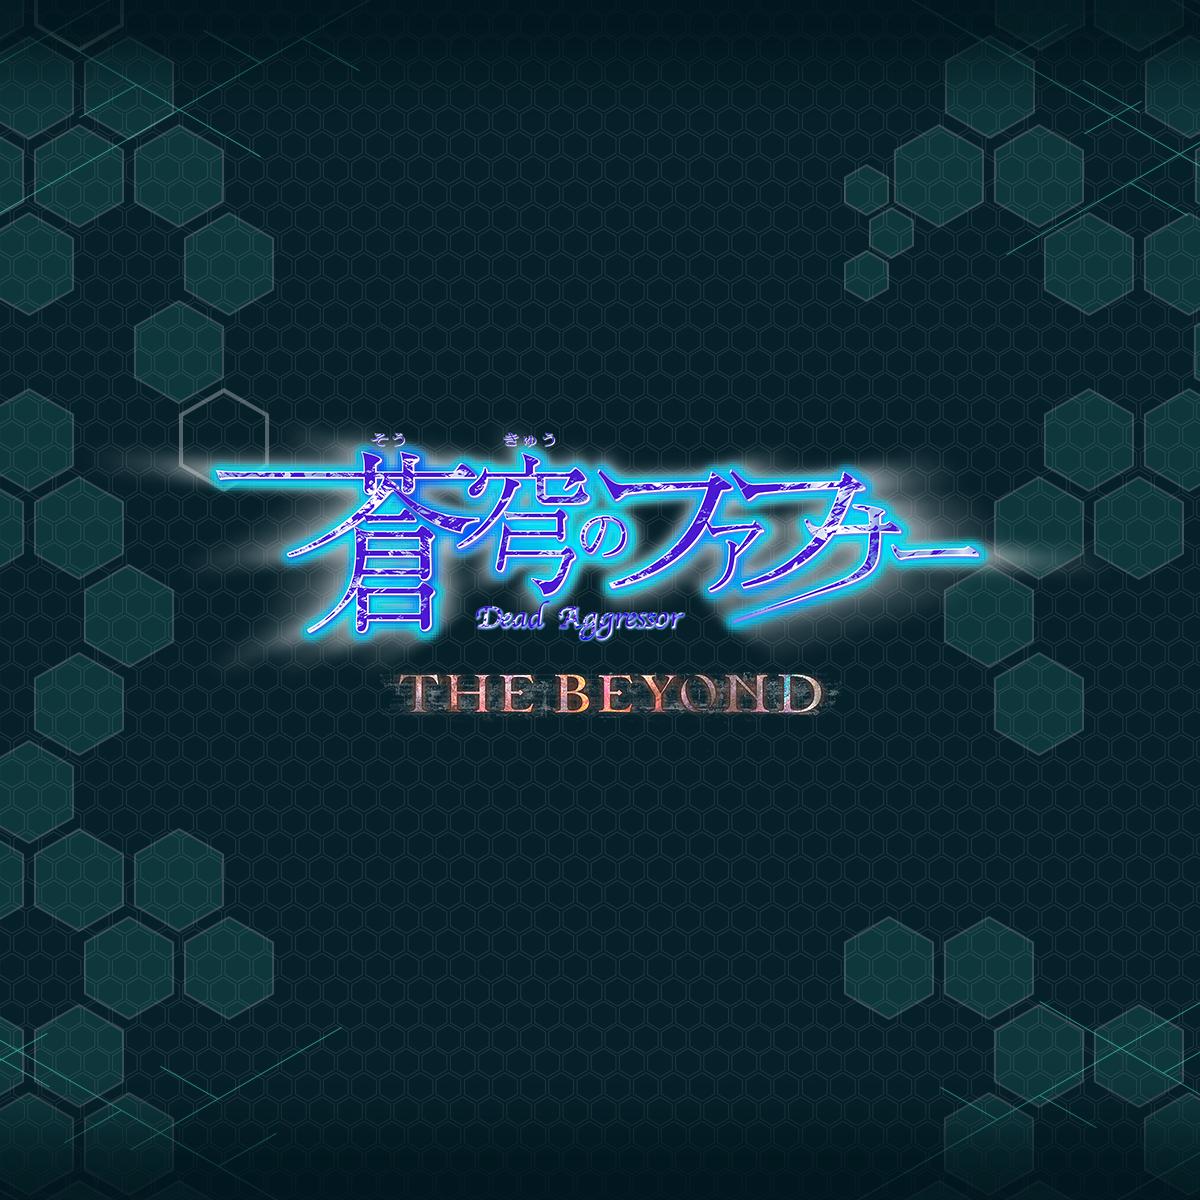 The ファフナー 蒼穹 beyond の